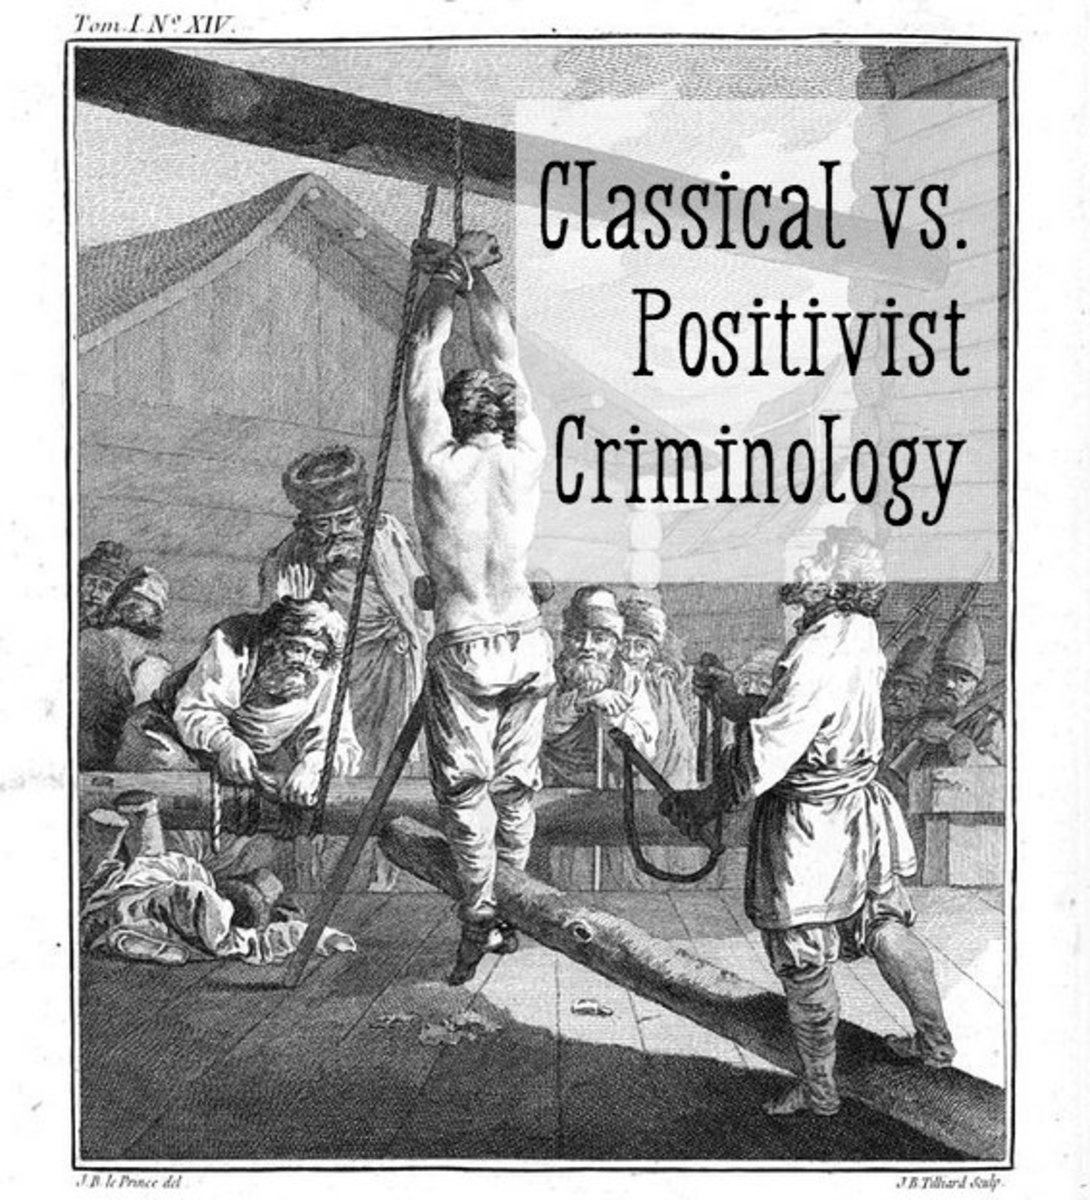 Classical vs. Positivist Criminology